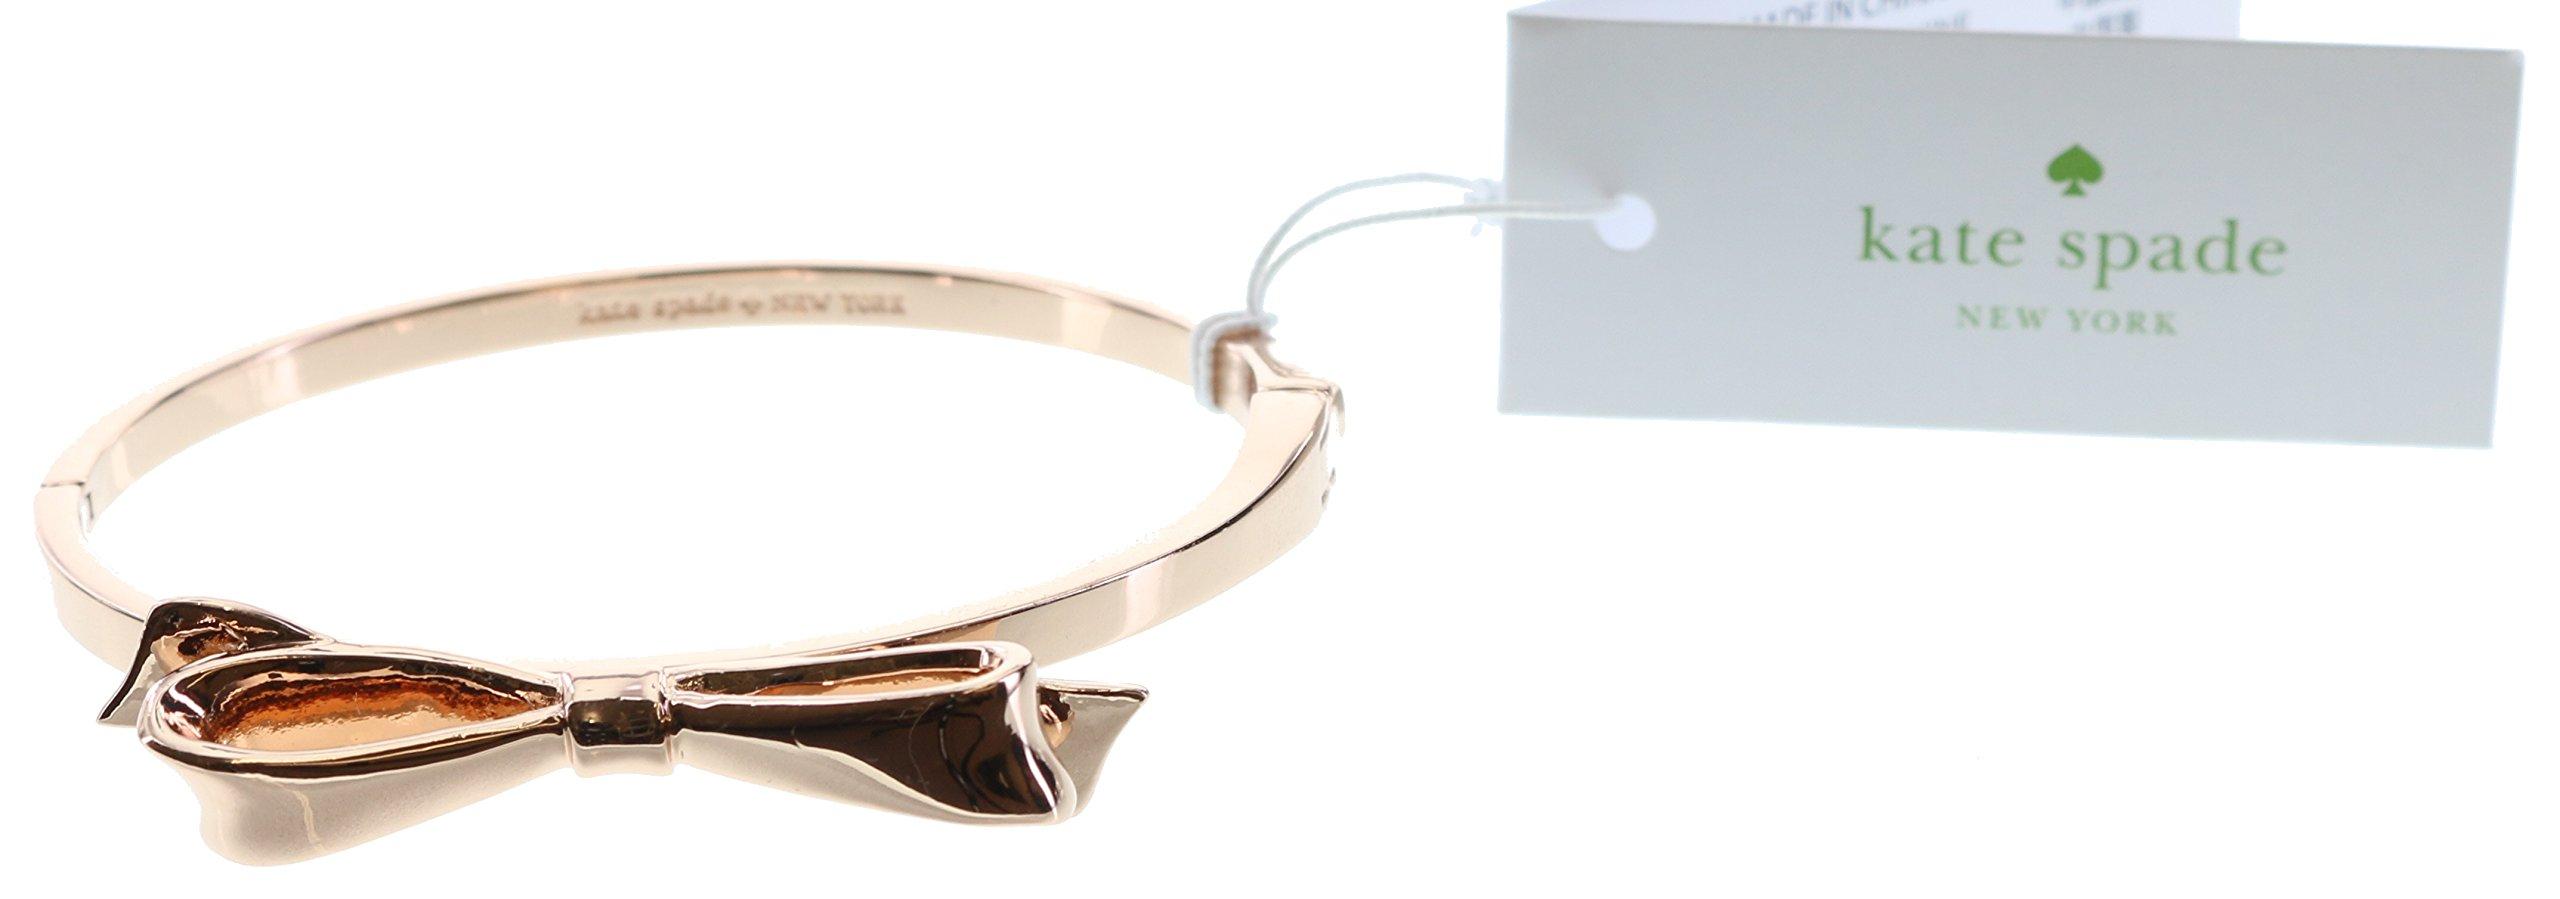 Kate Spade New York Love Notes Bangle Hinged Bracelet by Kate Spade New York